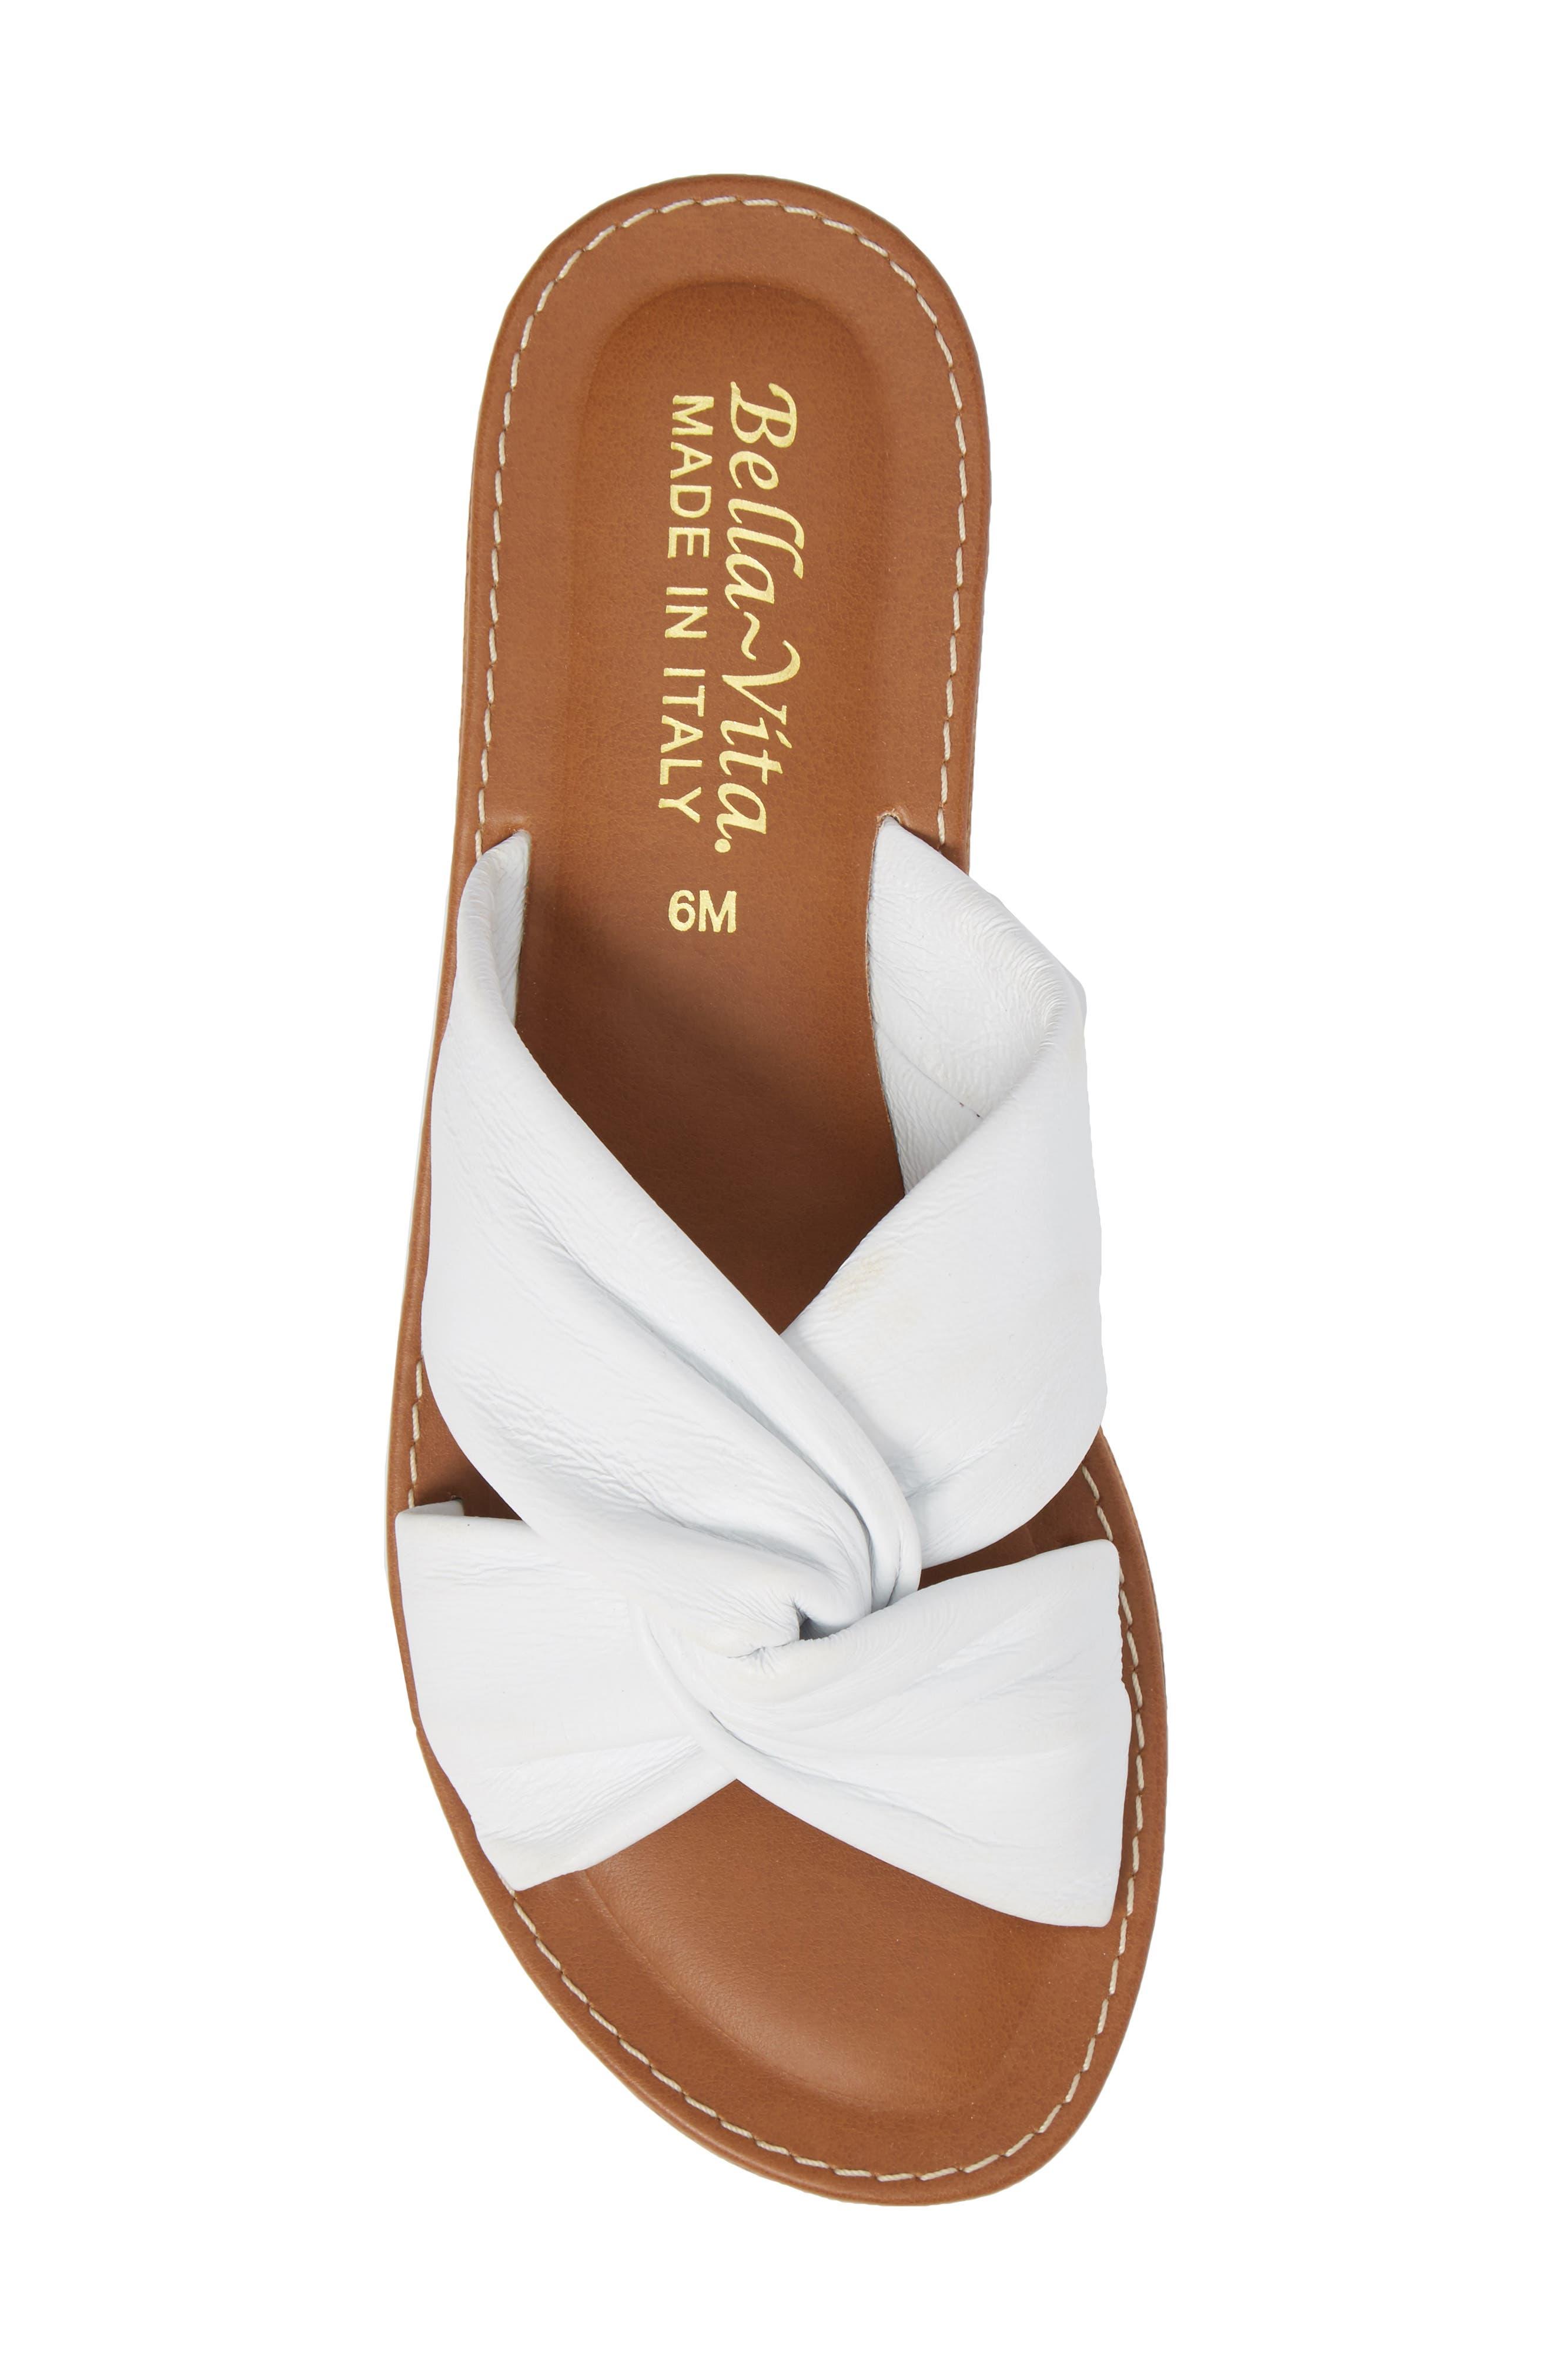 Noa Slide Sandal,                             Alternate thumbnail 5, color,                             White Leather